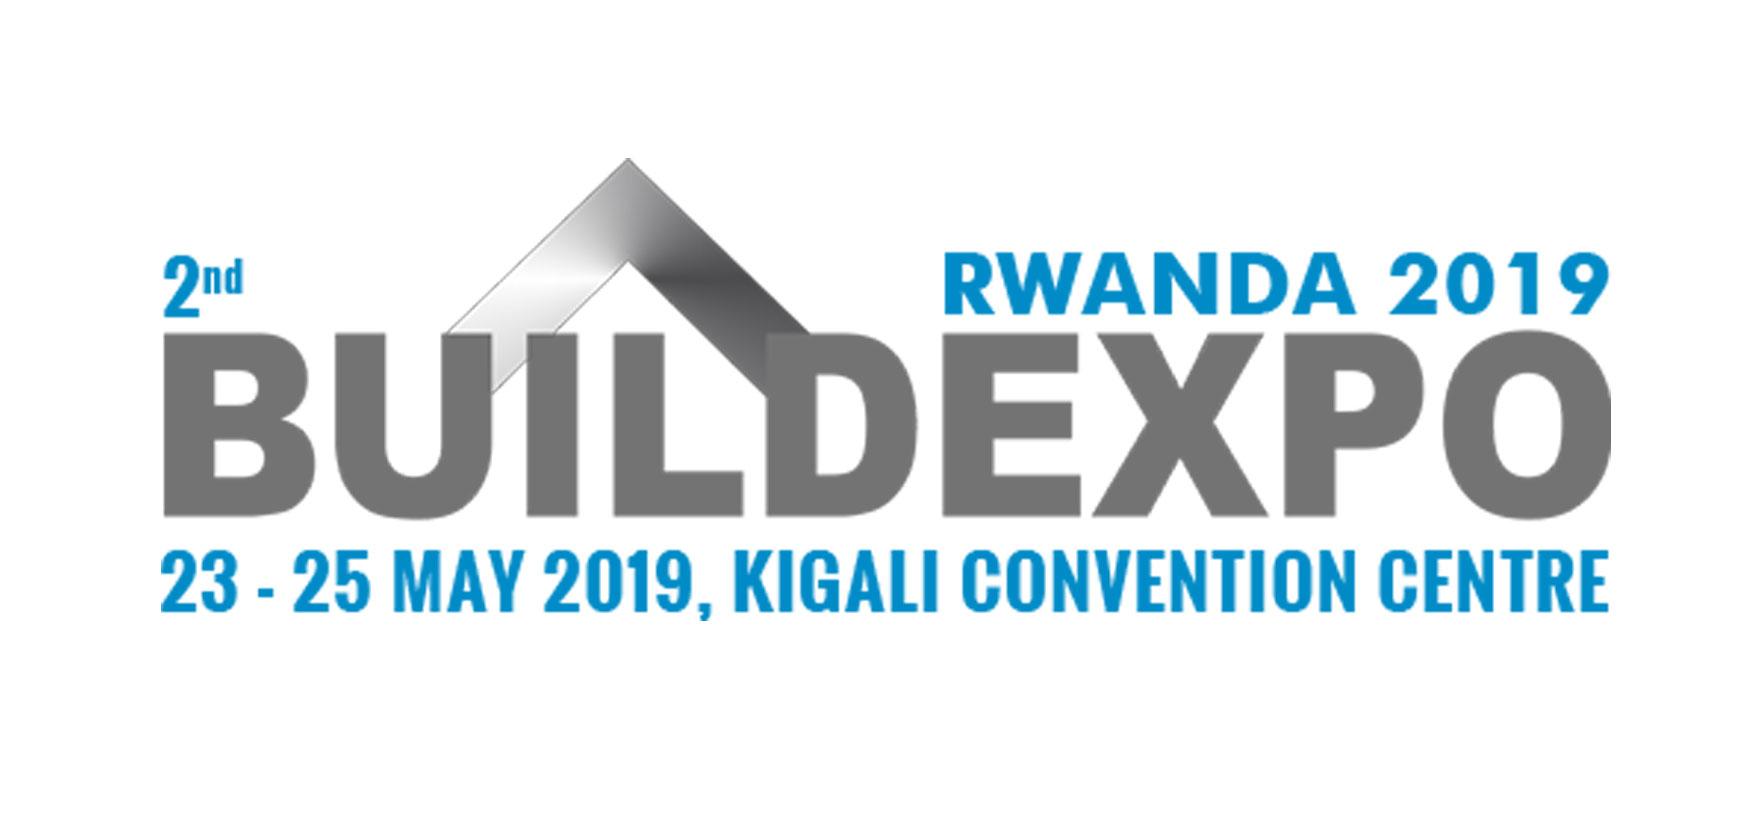 buildexpo-rwanda-icon